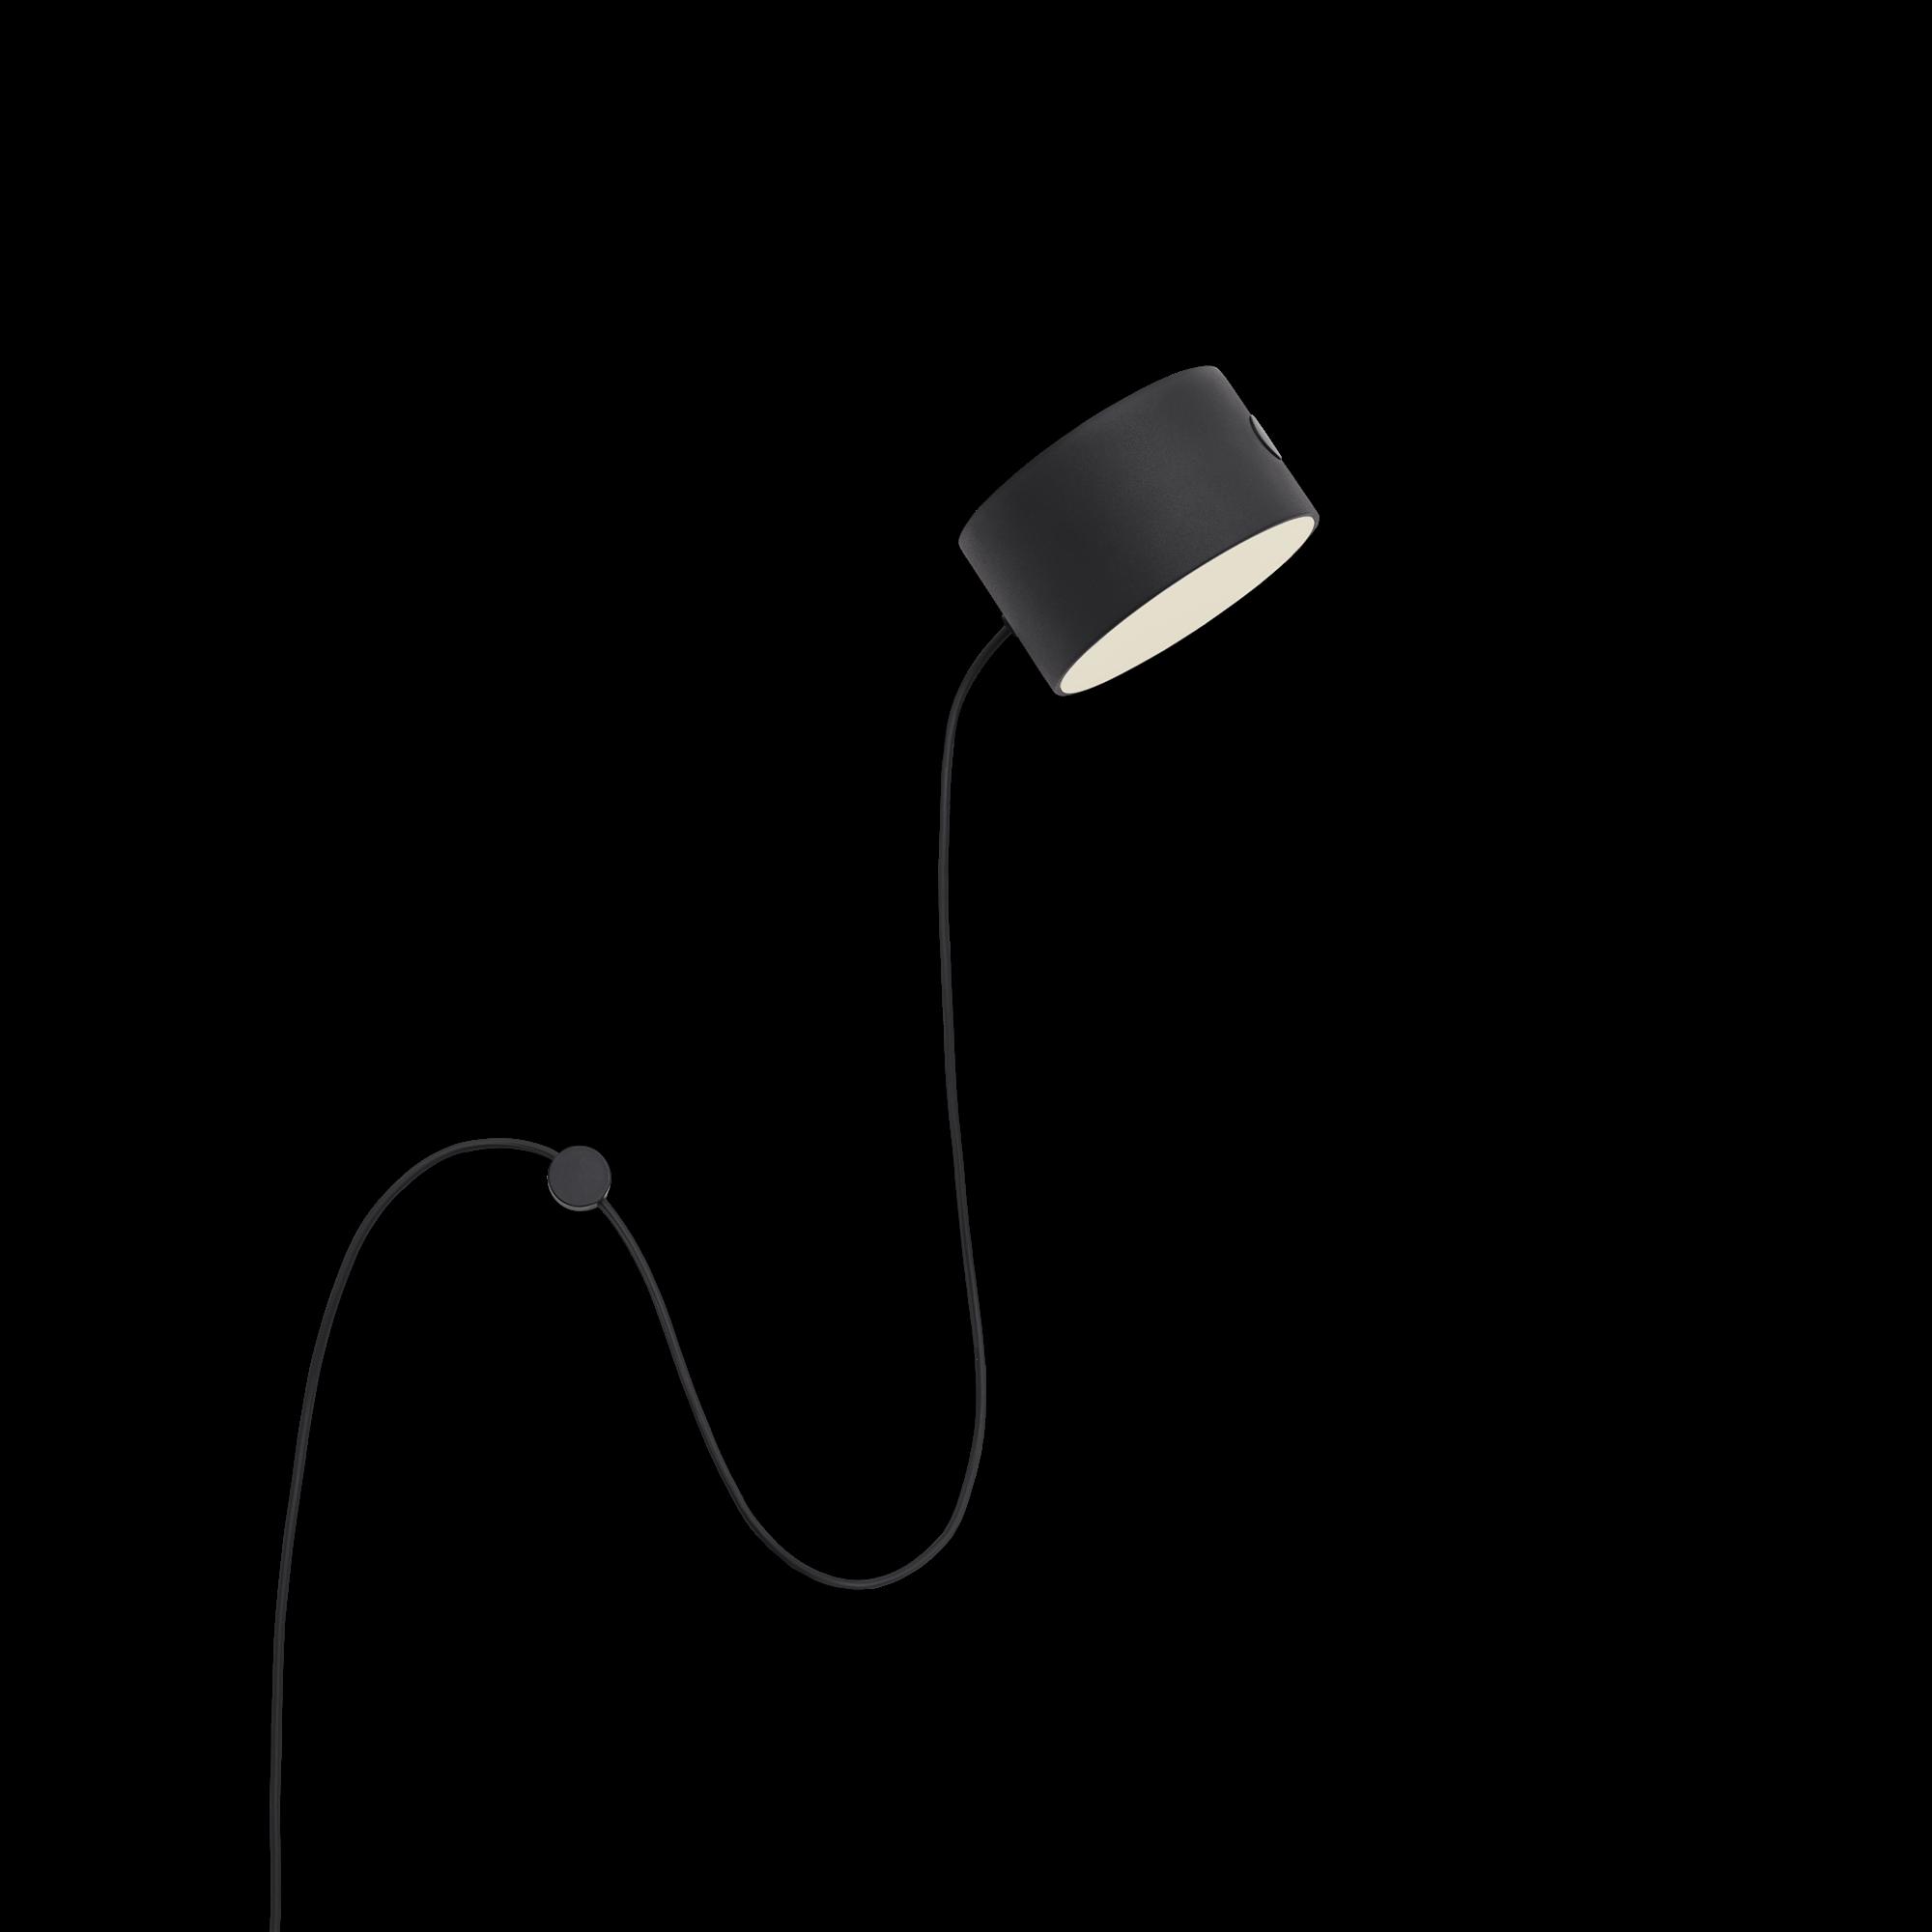 Muuto post wall lamp lifestyle contemporary designer lighting